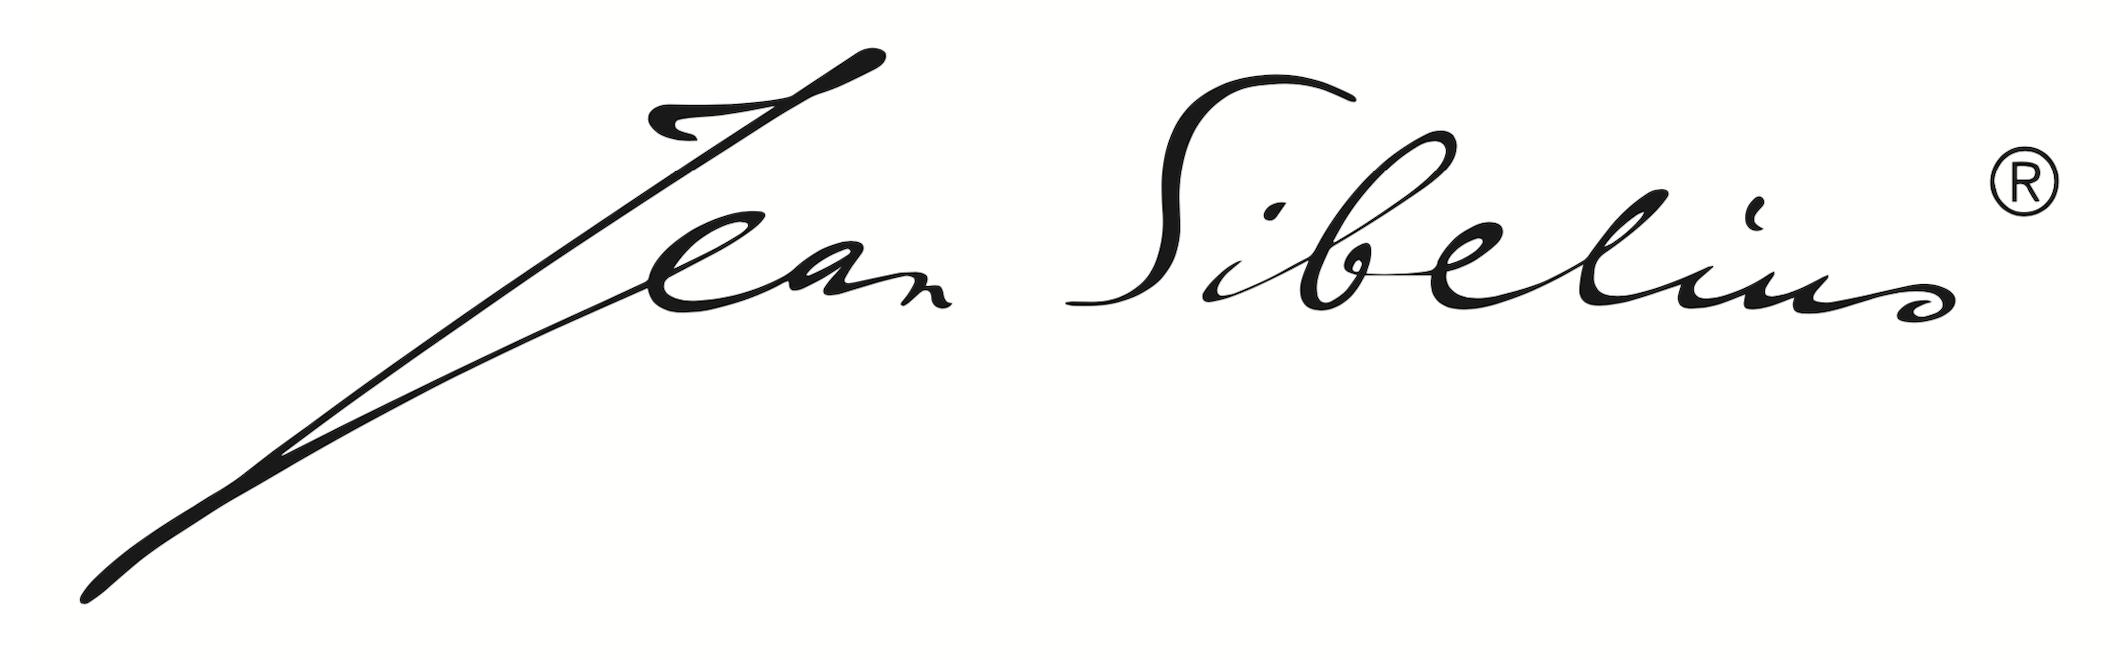 Sib logo kapea.png